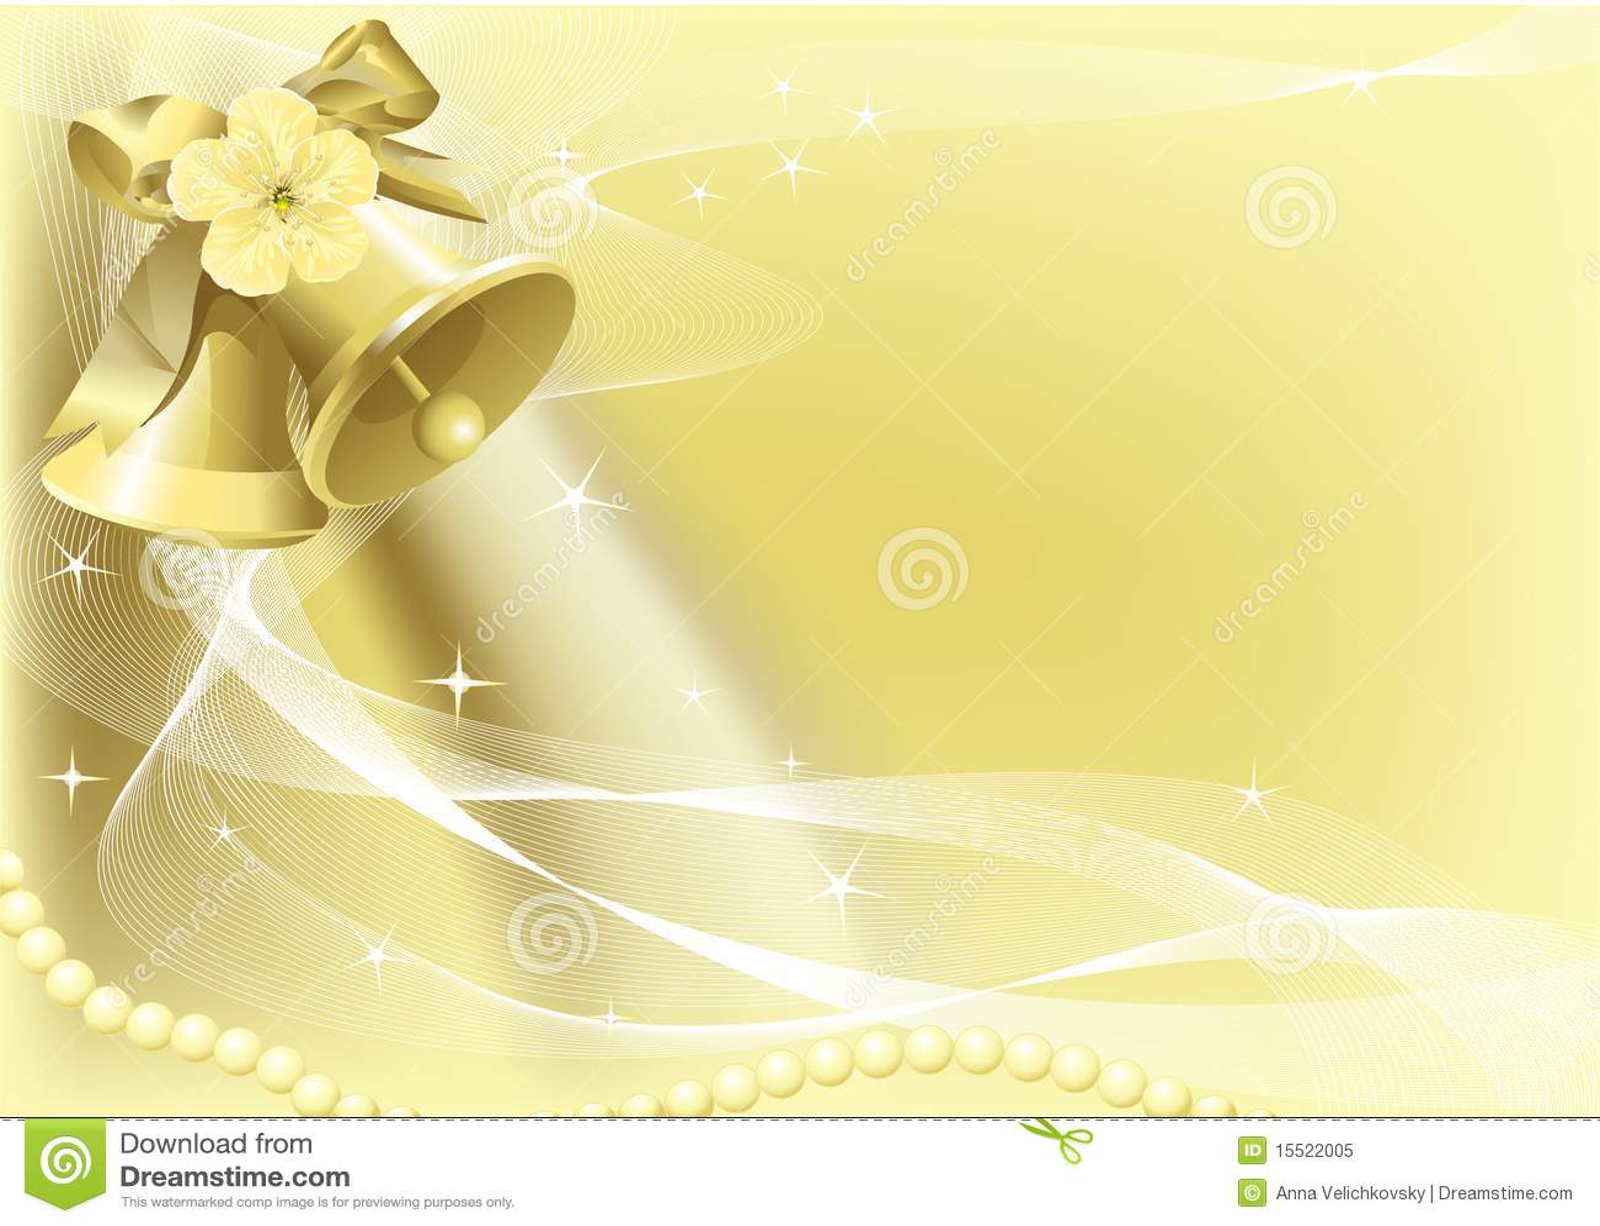 Invitation Cards For Wedding Anniversary as amazing invitation sample